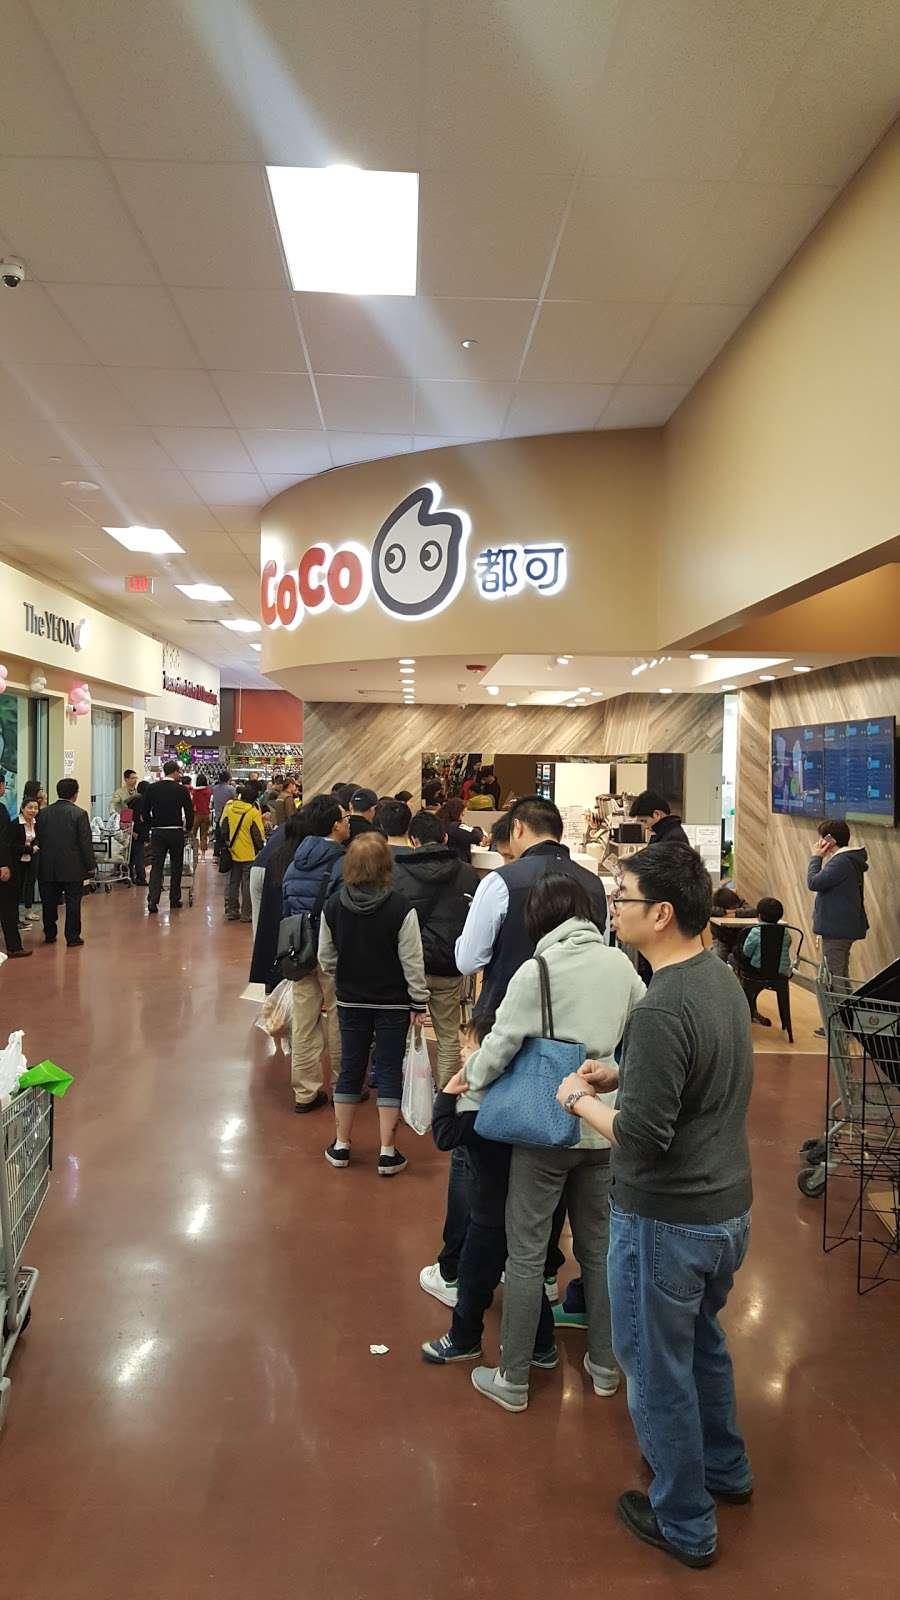 CoCo Fresh Tea & Juice - cafe  | Photo 3 of 8 | Address: 420 Grand St, Jersey City, NJ 07302, USA | Phone: (201) 763-7375